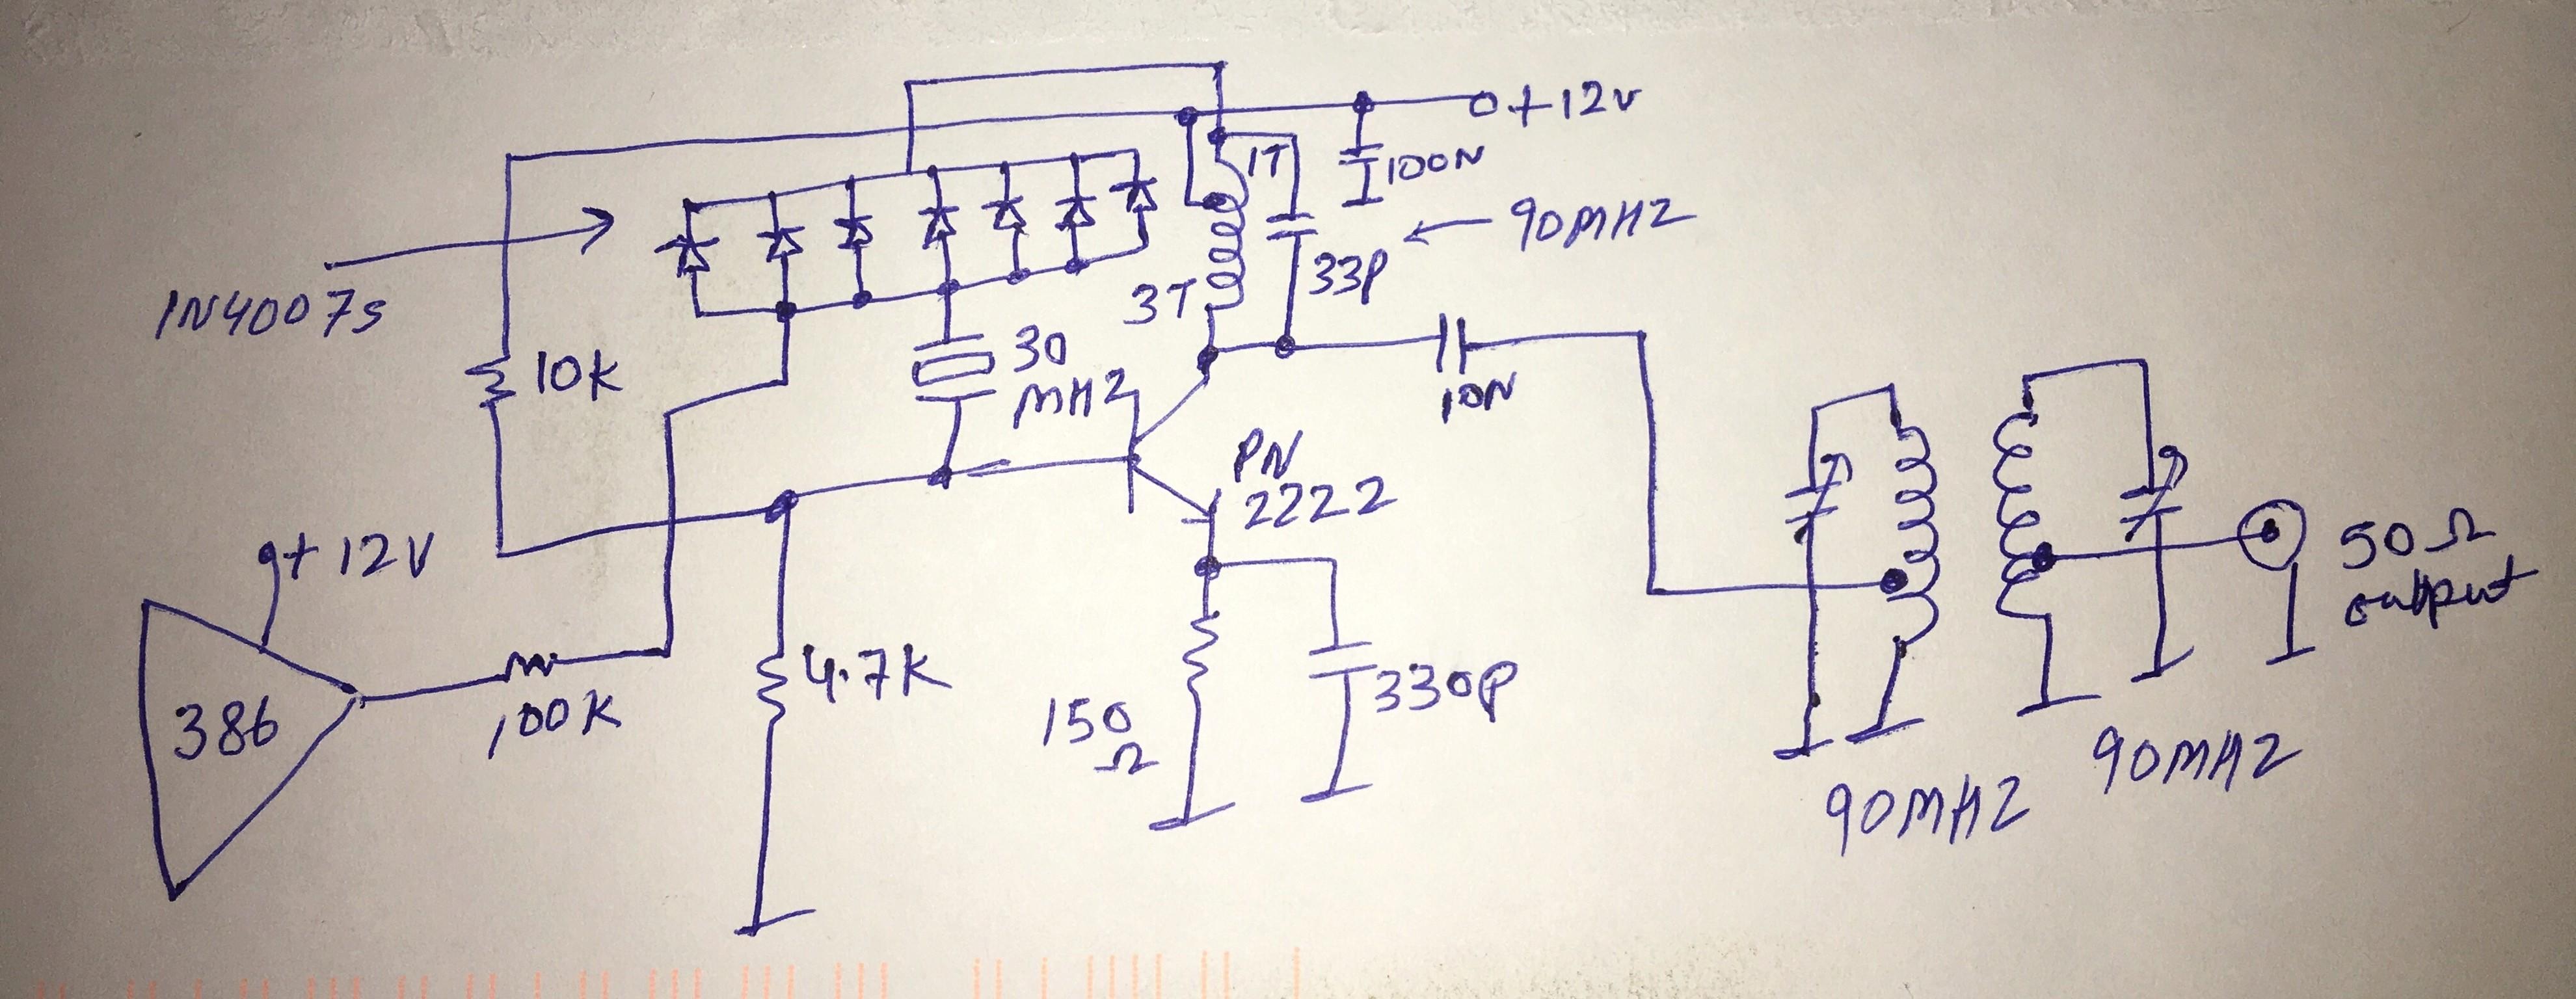 10 mW NBFM Transmitter Schematic  54d96f10